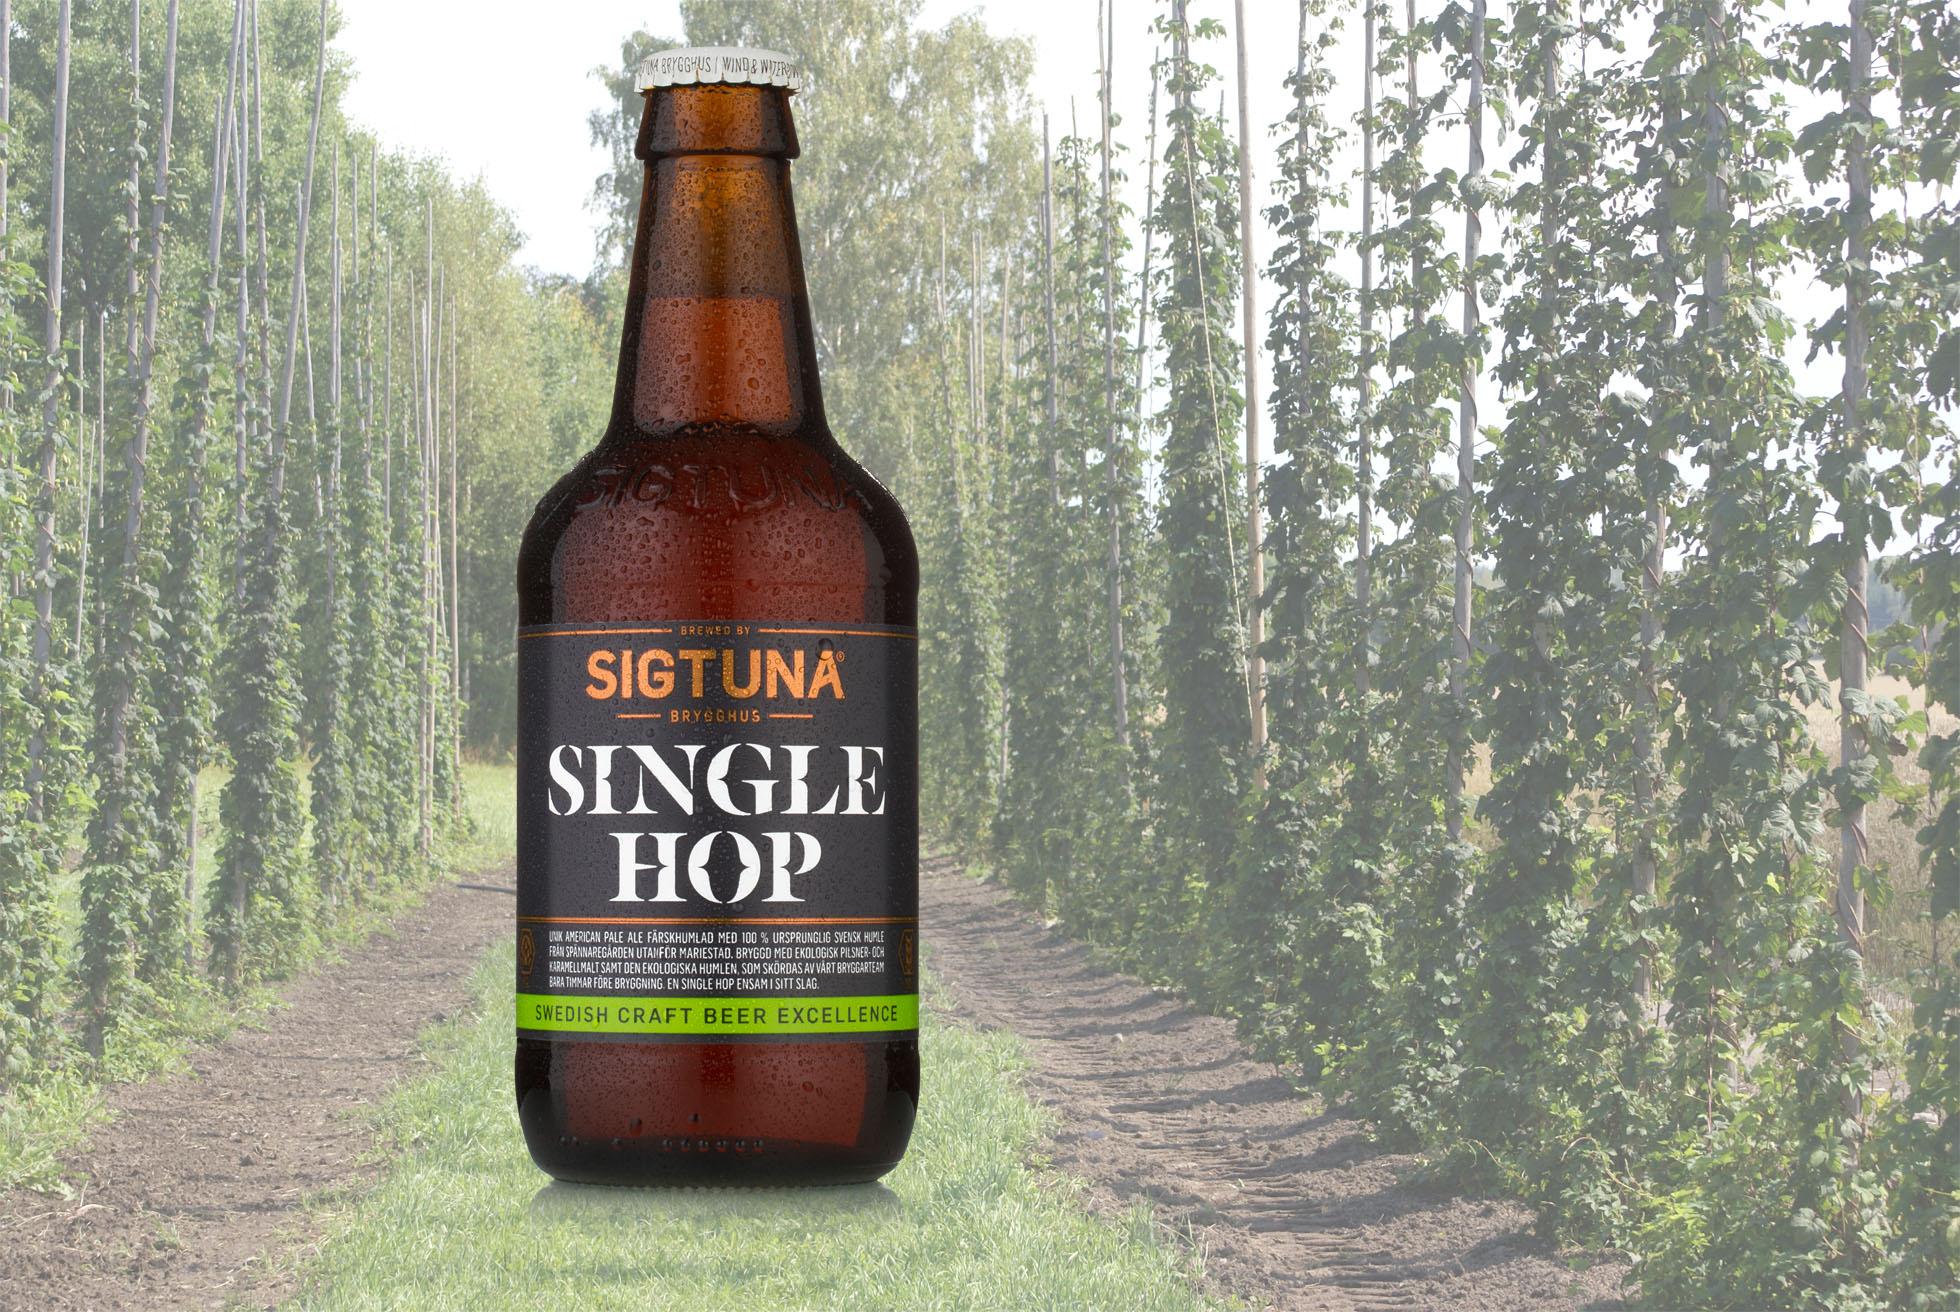 Sigtuna Swedish Single Hop Organic Pale Ale